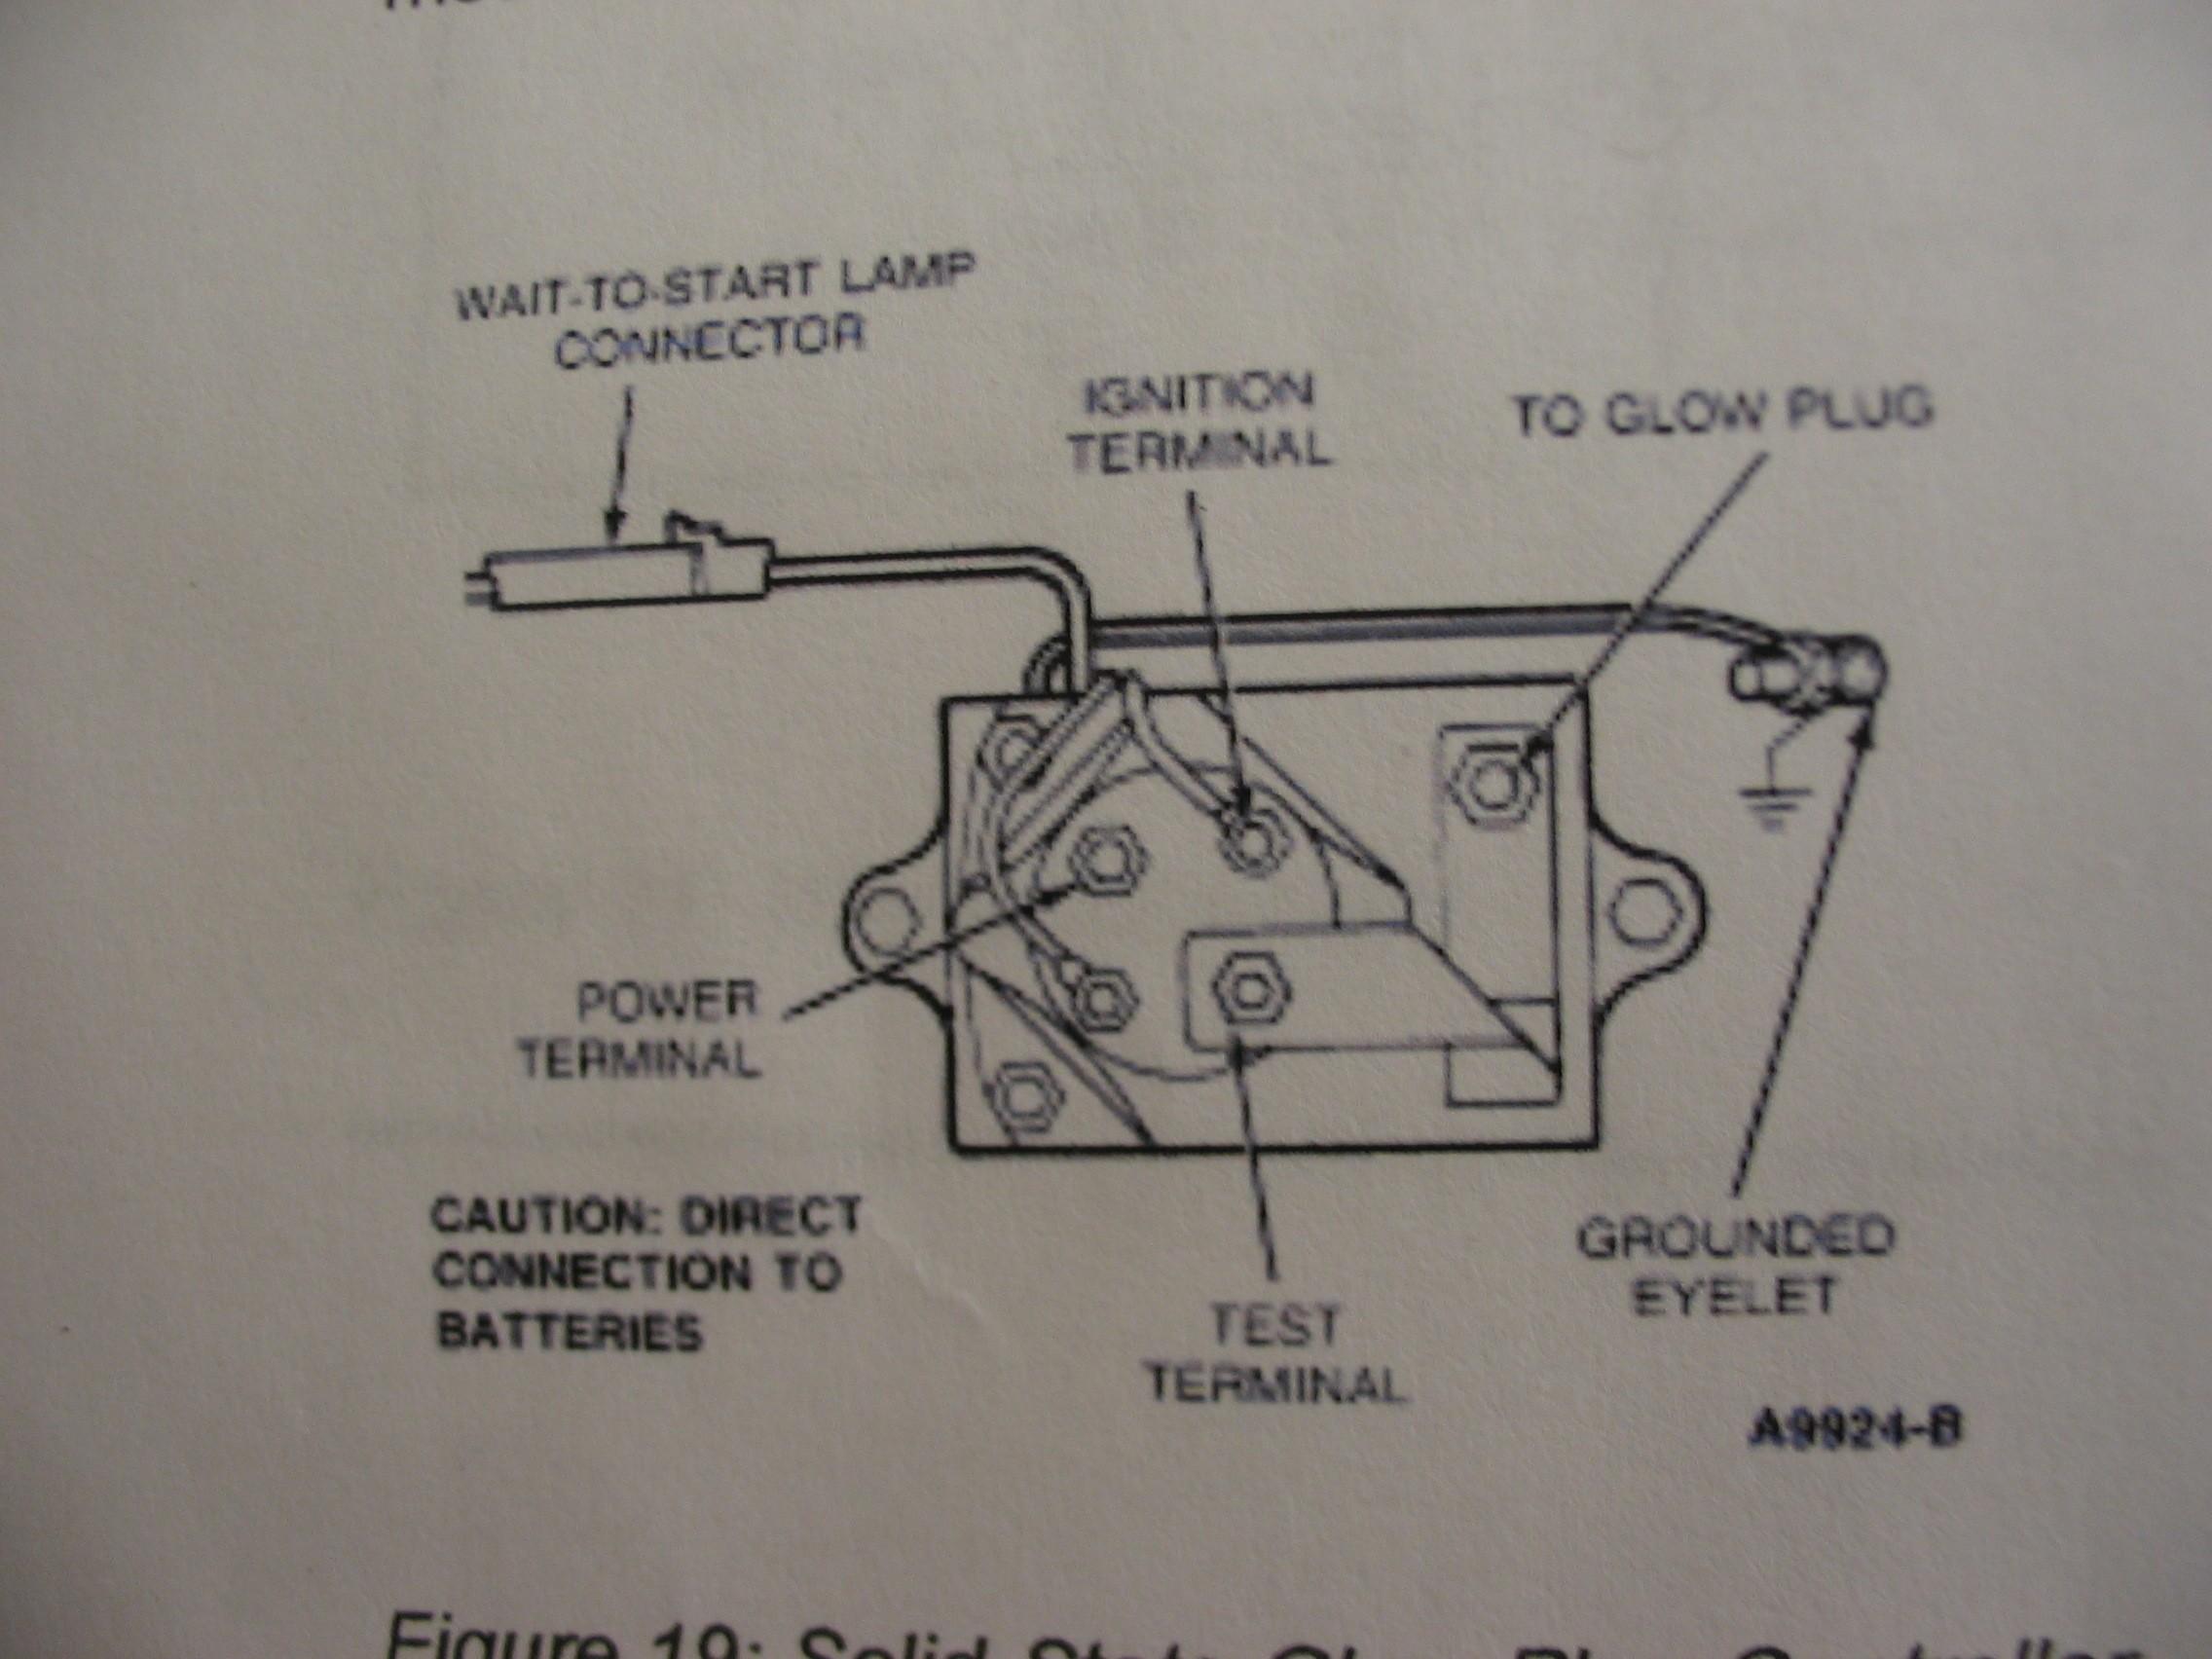 7.3 Glow Plug Controller Diagram Hy 2699] Glow Plug Relay Wiring Schematic Of 7.3 Glow Plug Controller Diagram